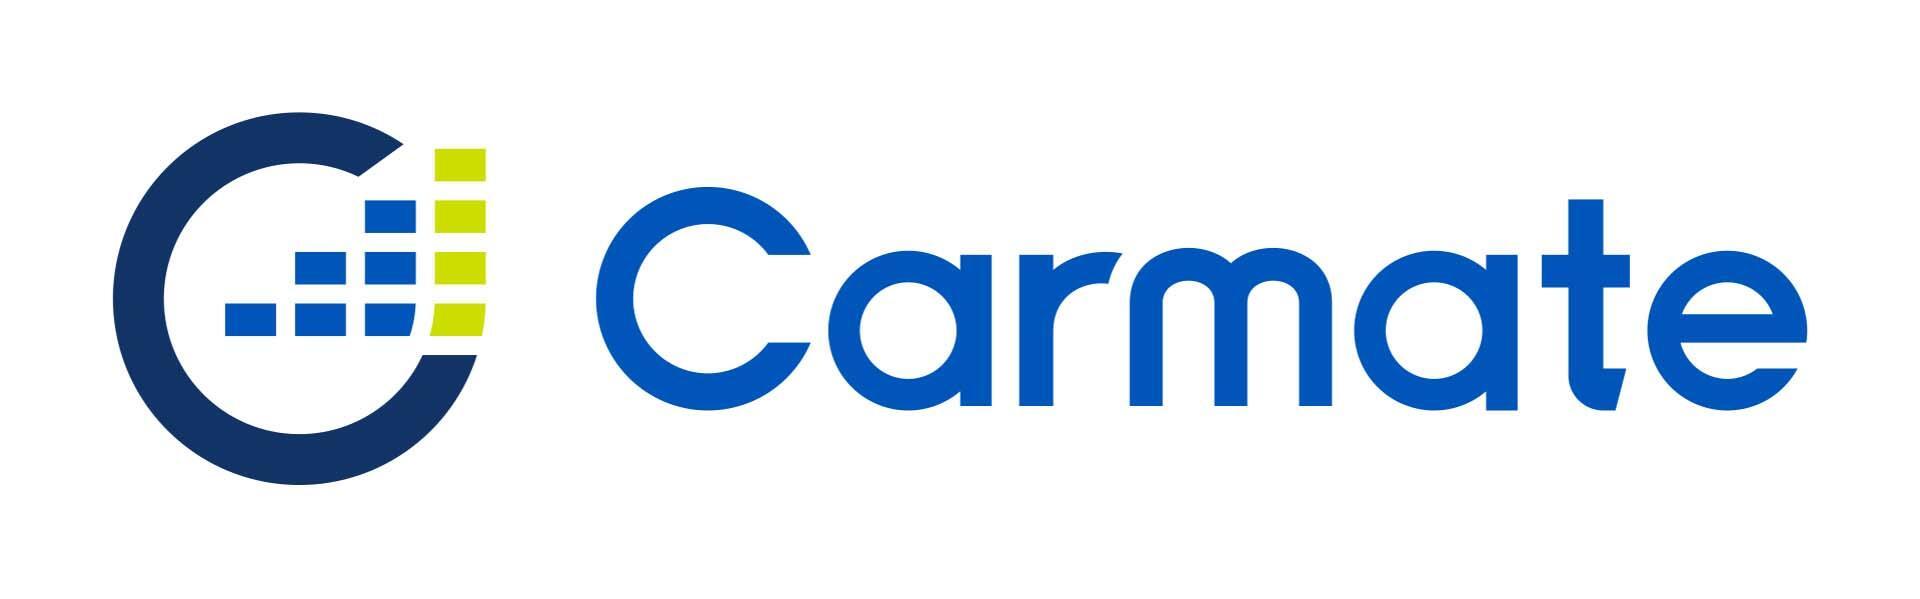 carmateco-logo.jpg